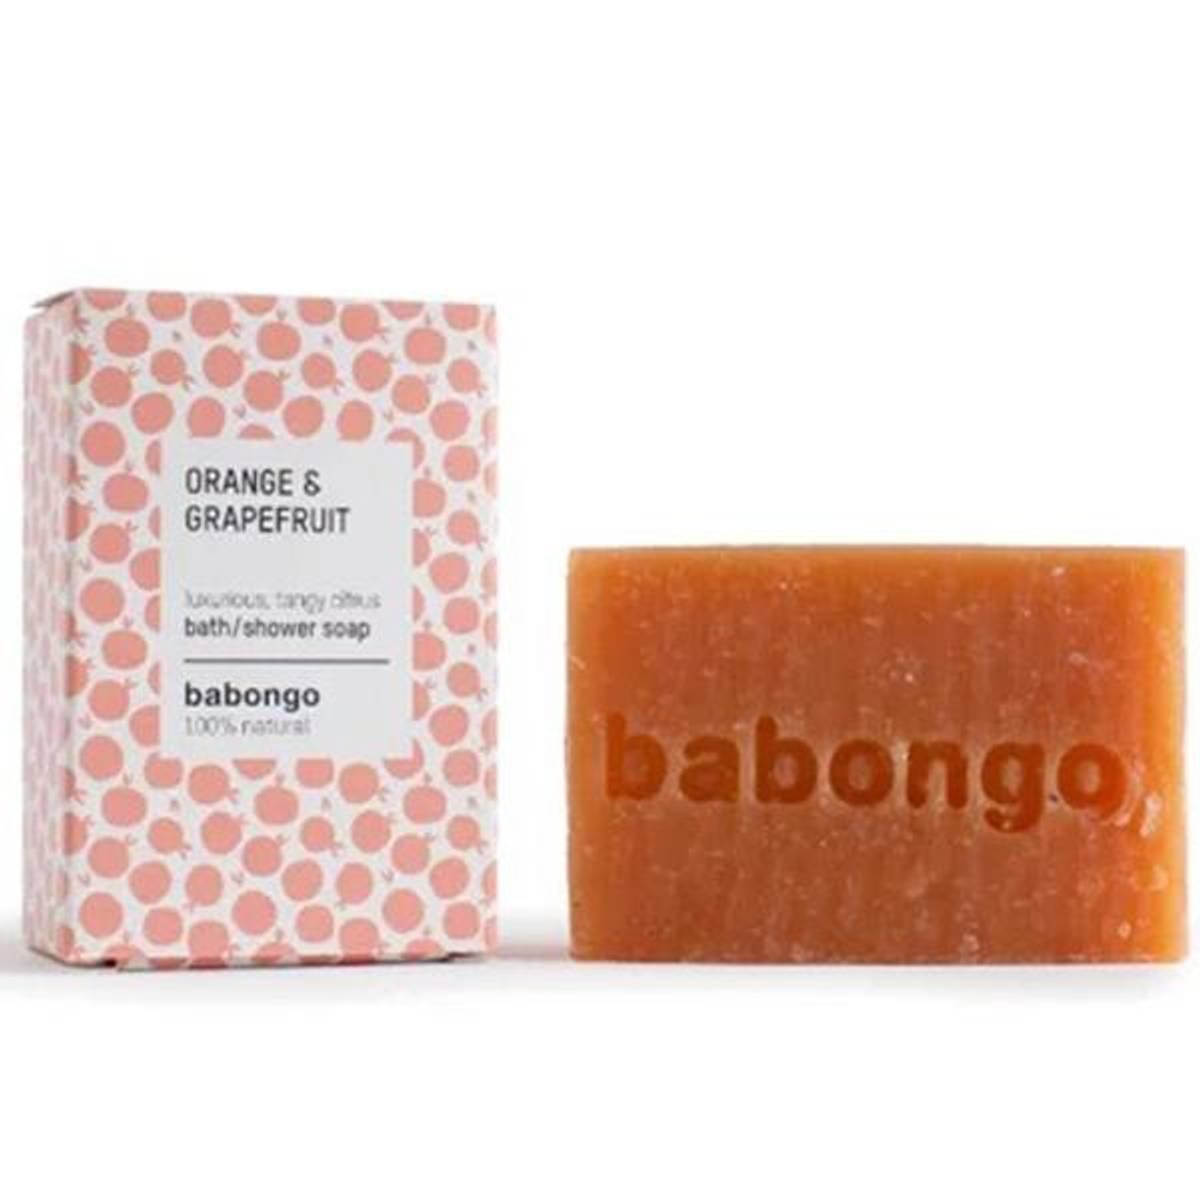 Babongo Soap Orange & Grapefruit Bath&Shower